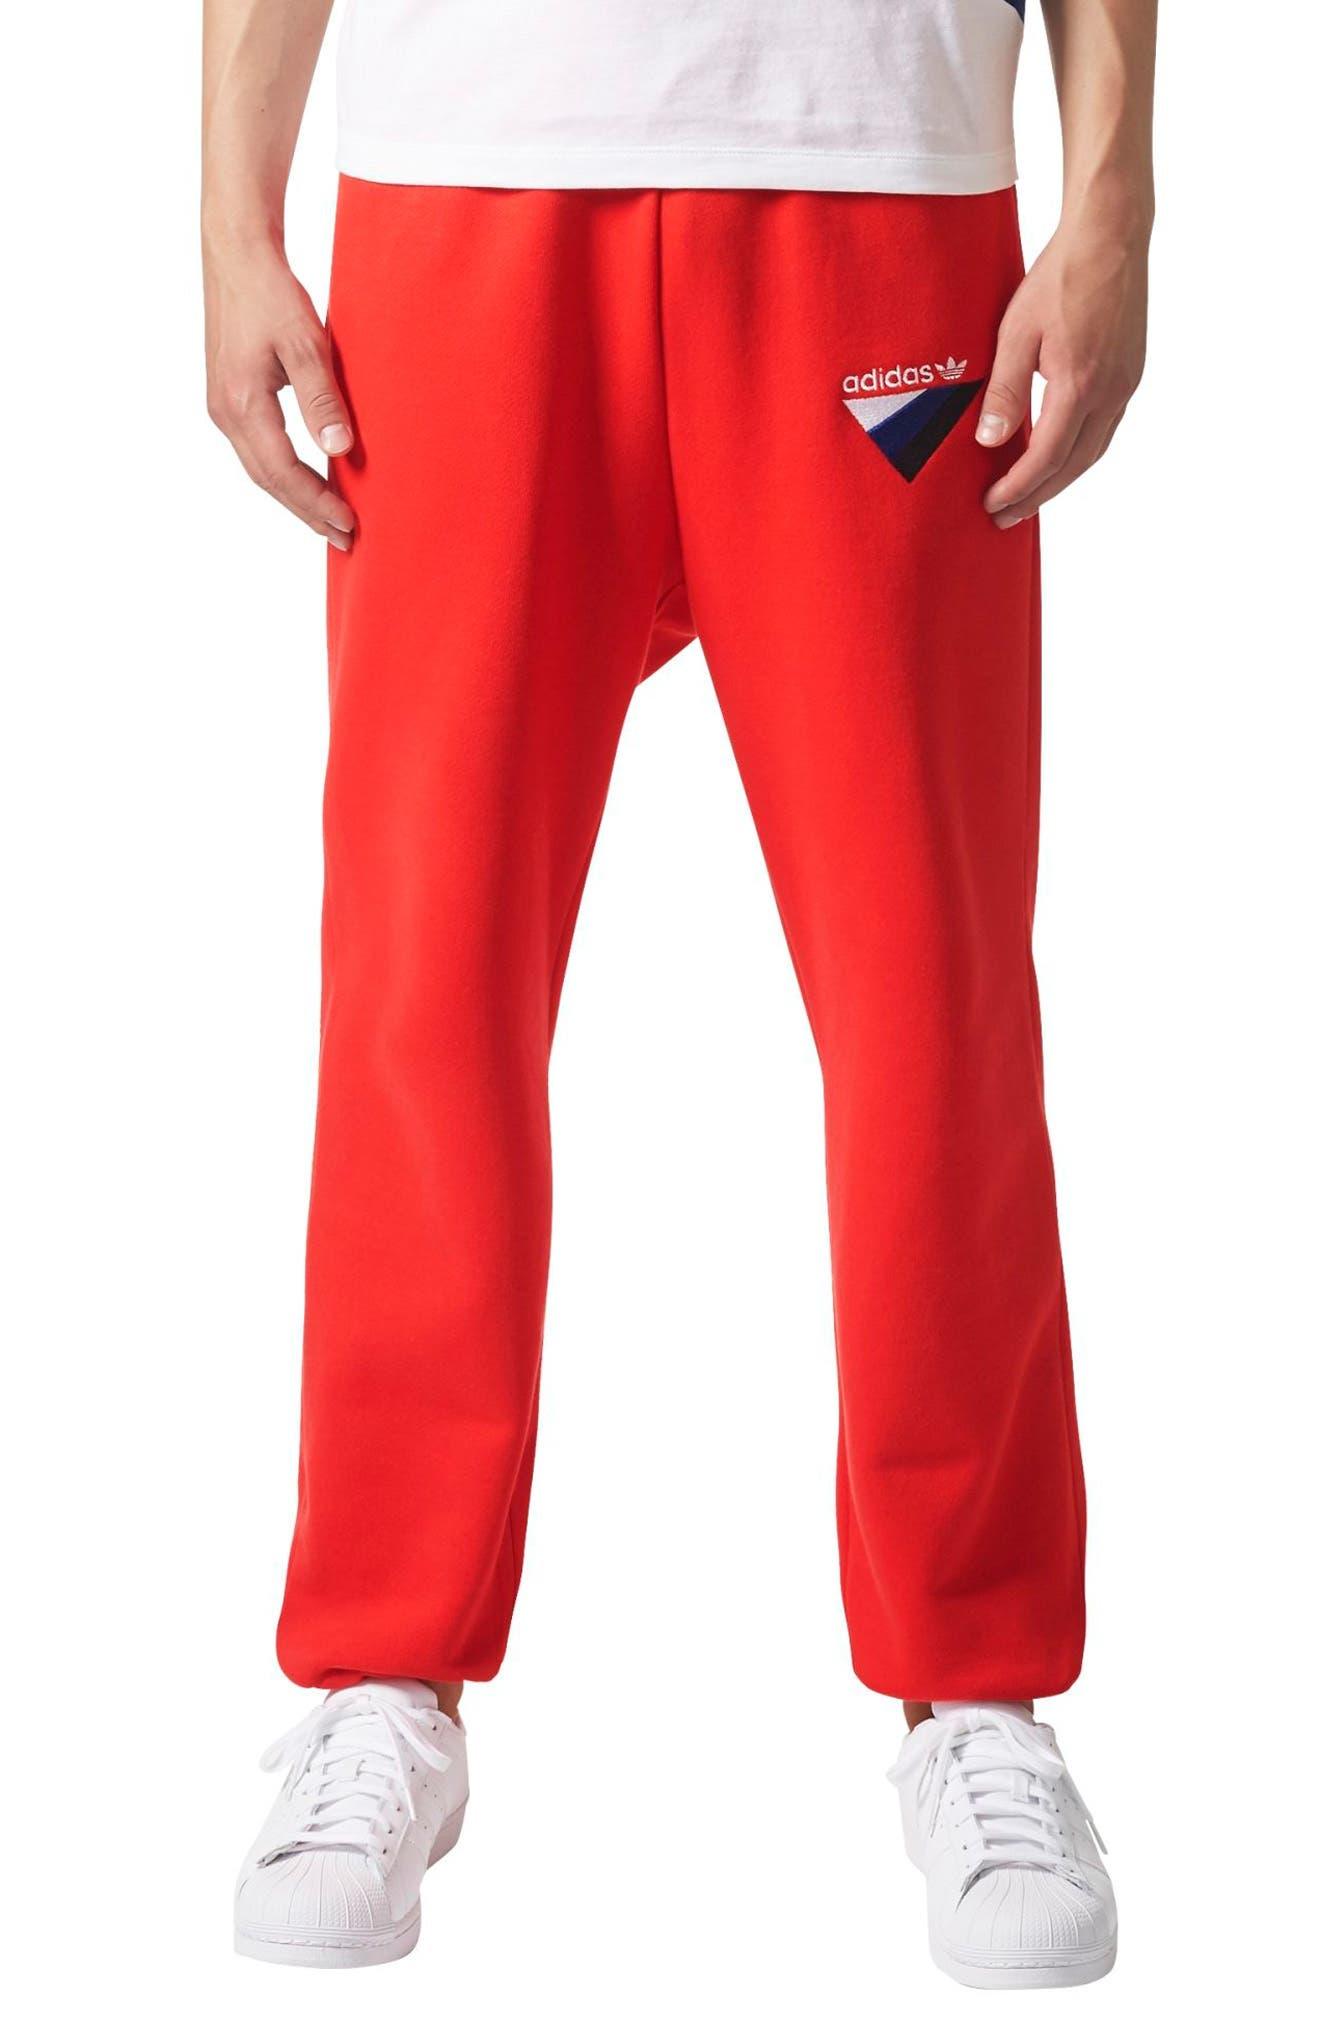 Originals Anichkov Sweatpants,                         Main,                         color, Vivid Red